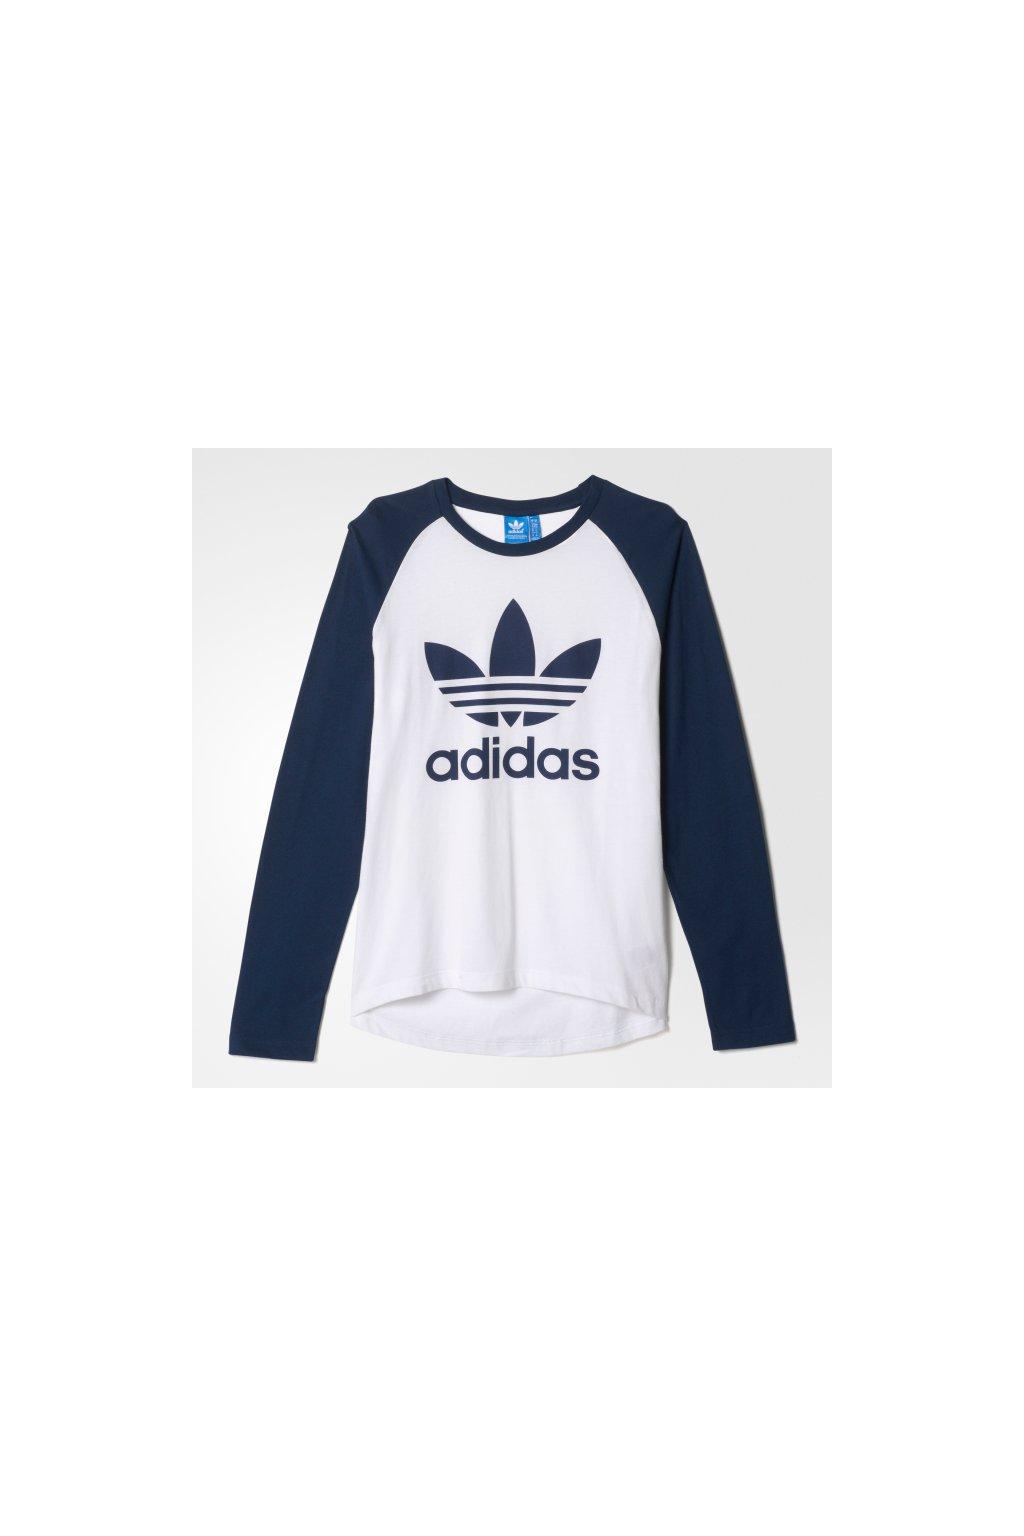 adidas ORG LS JERSEY AB7540